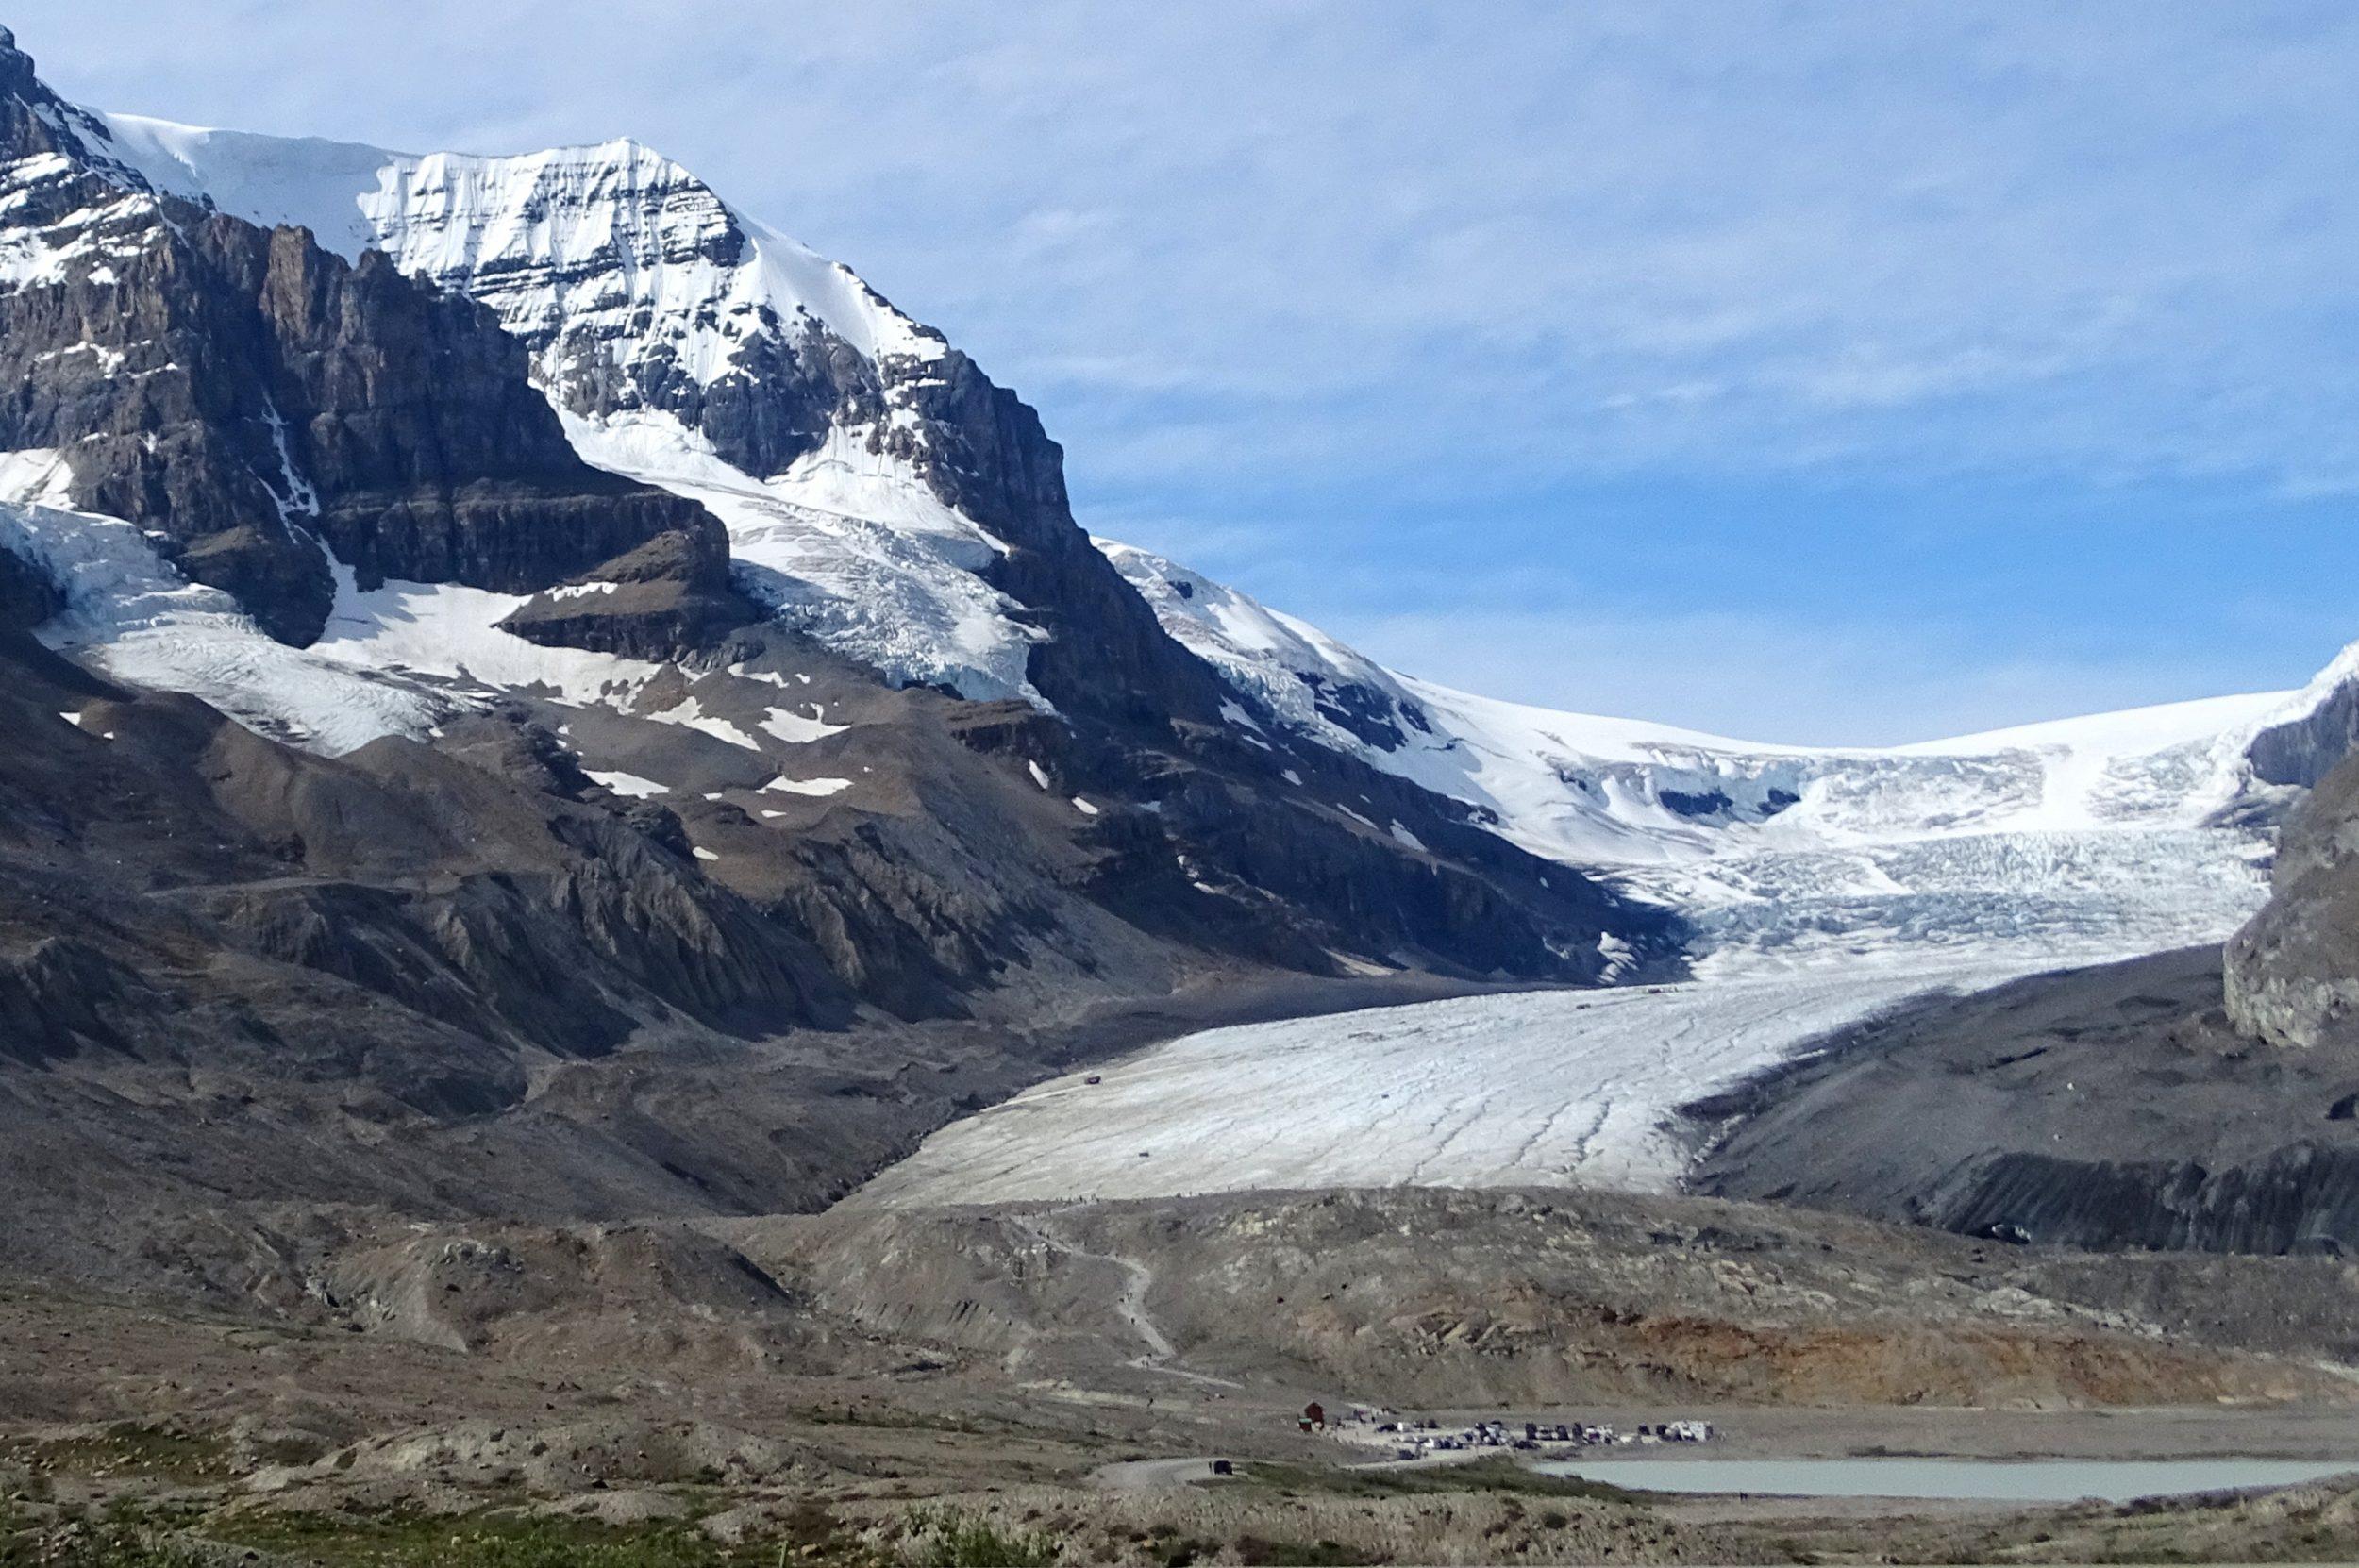 Athabasca-gletsjer in de verte